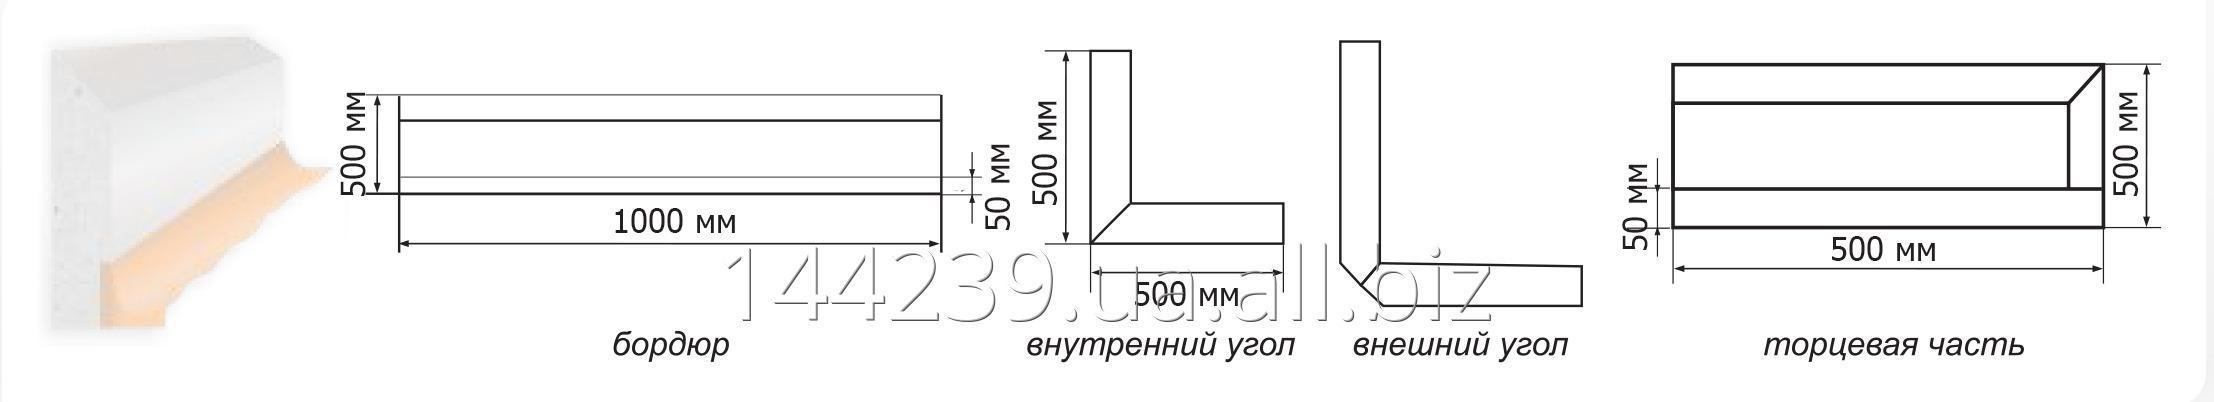 bordyur_zashhitnyj_politon_bru_50_n